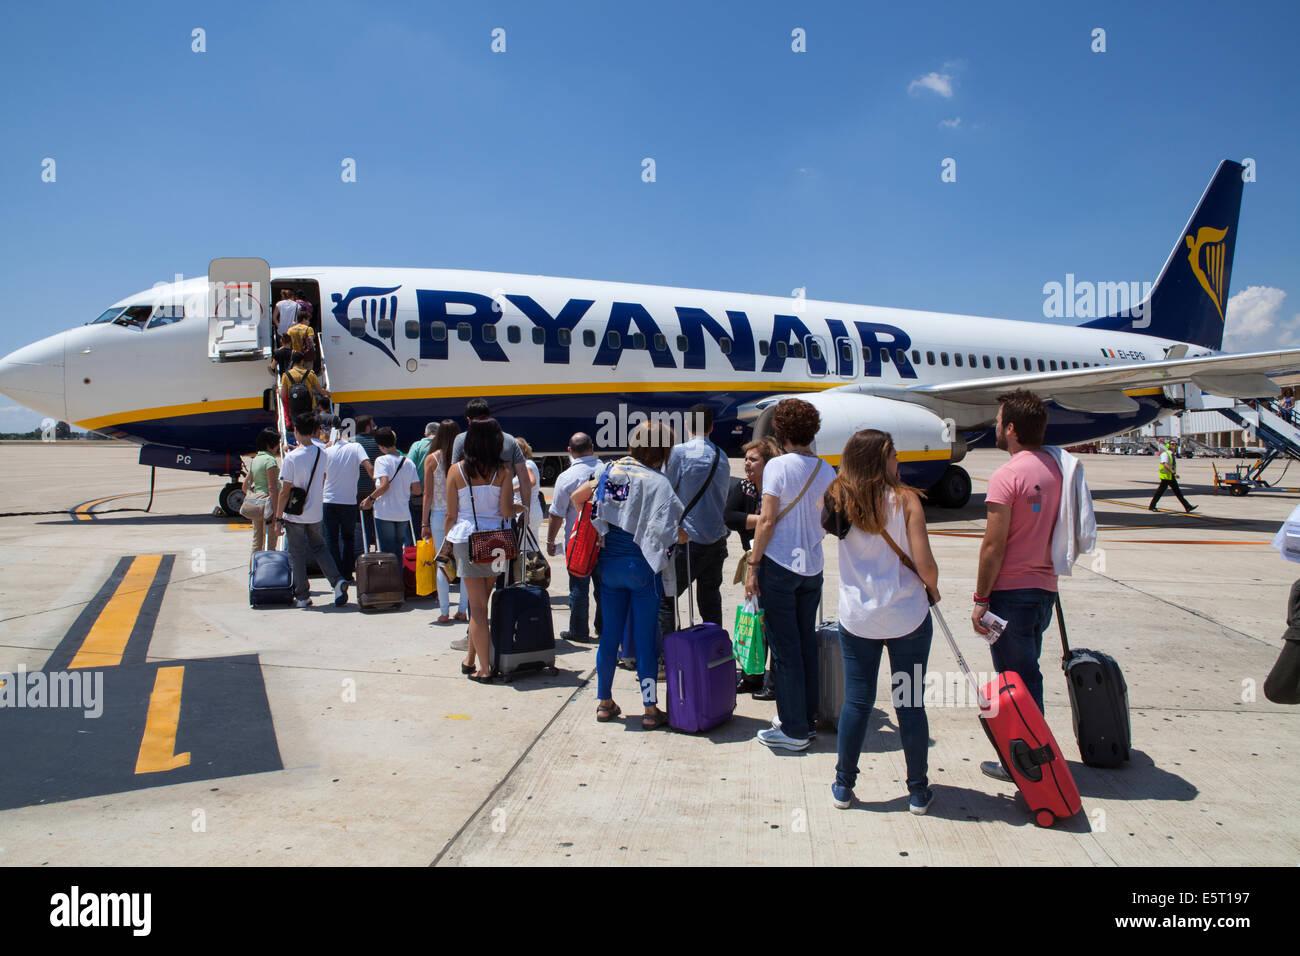 Passengers board a Ryanair flight at Seville airport Stock Photo